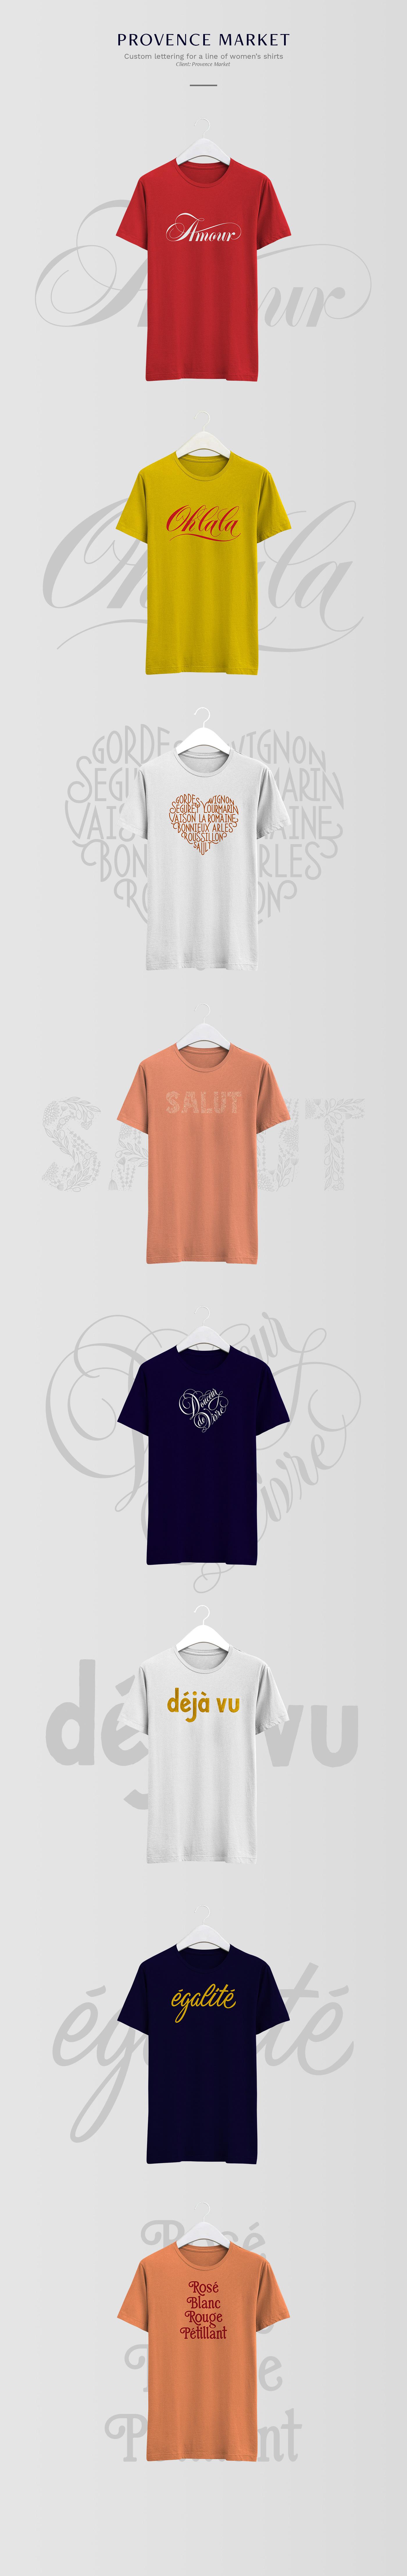 Image may contain: active shirt, fashion and sleeve